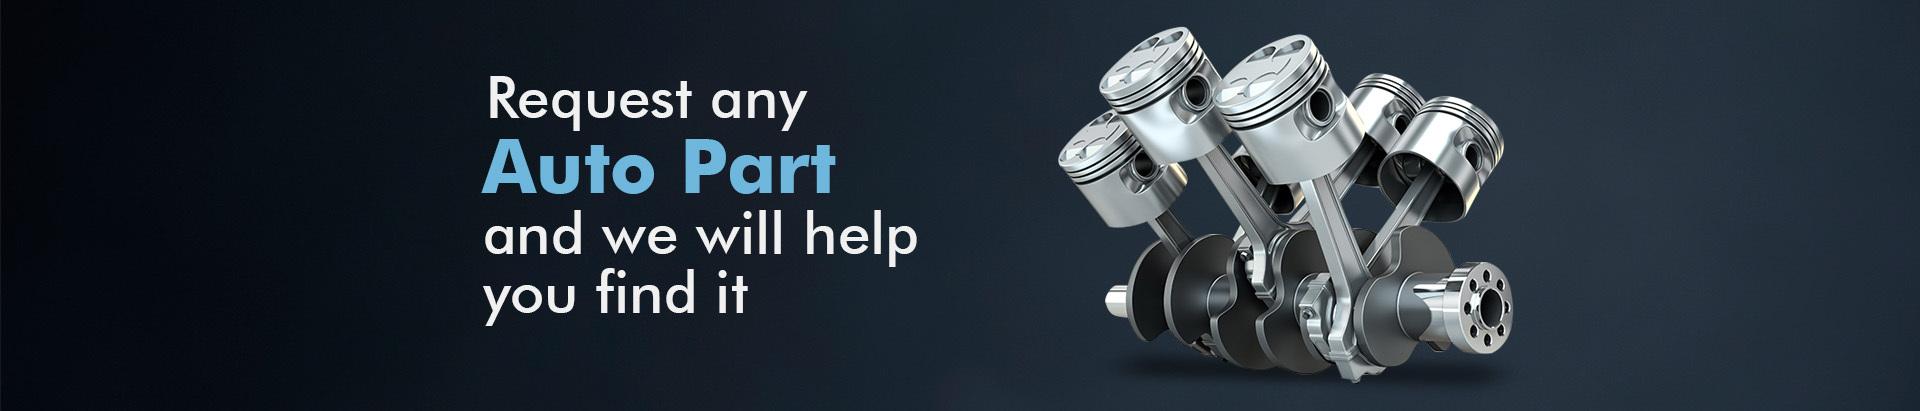 auto and auto parts